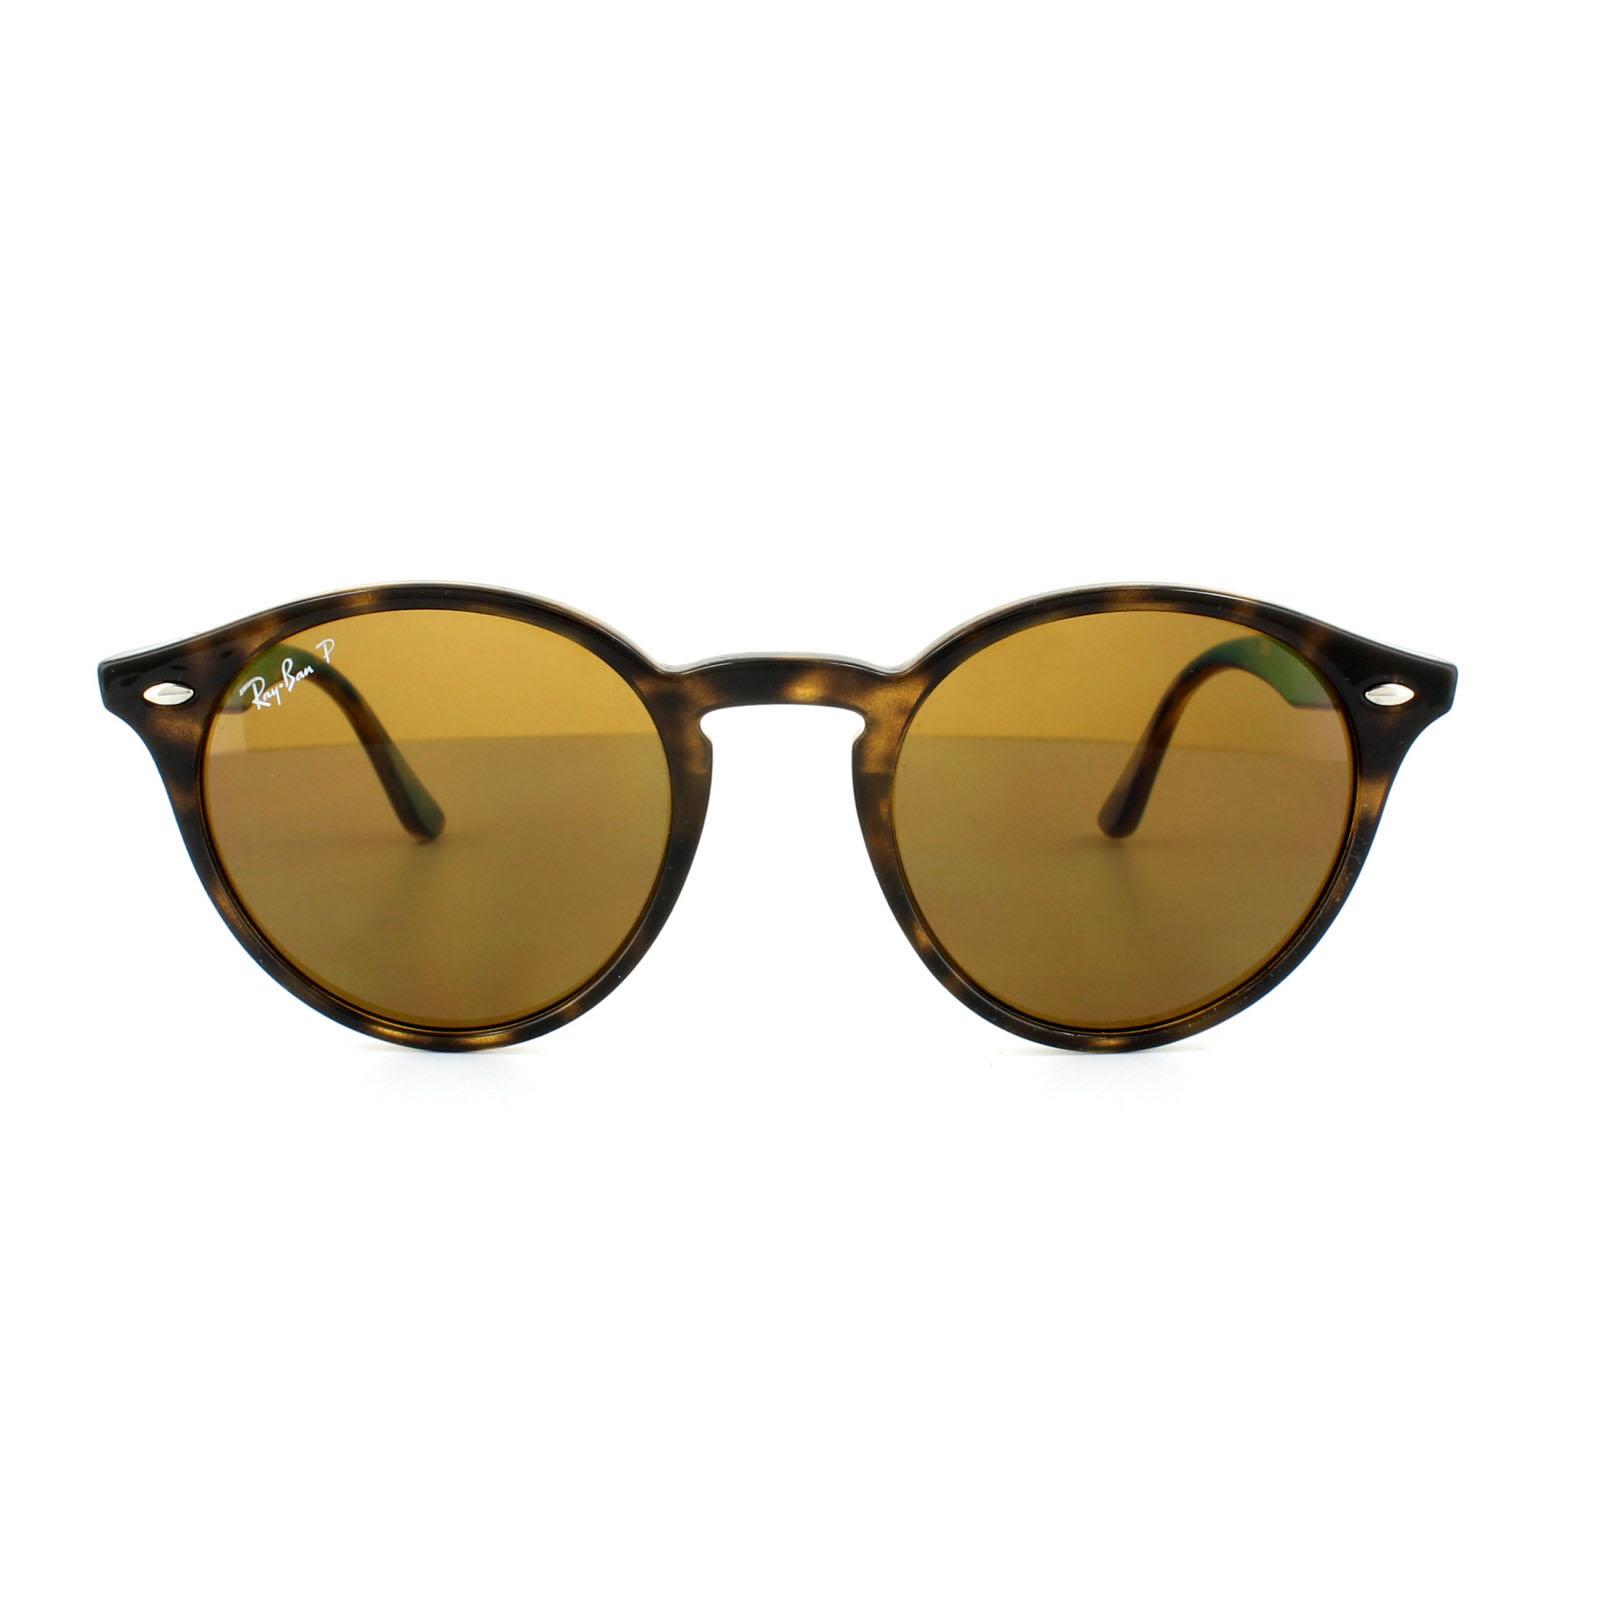 da656214cd Ray Ban Femme 2180 Polarized. Sunglasses ...